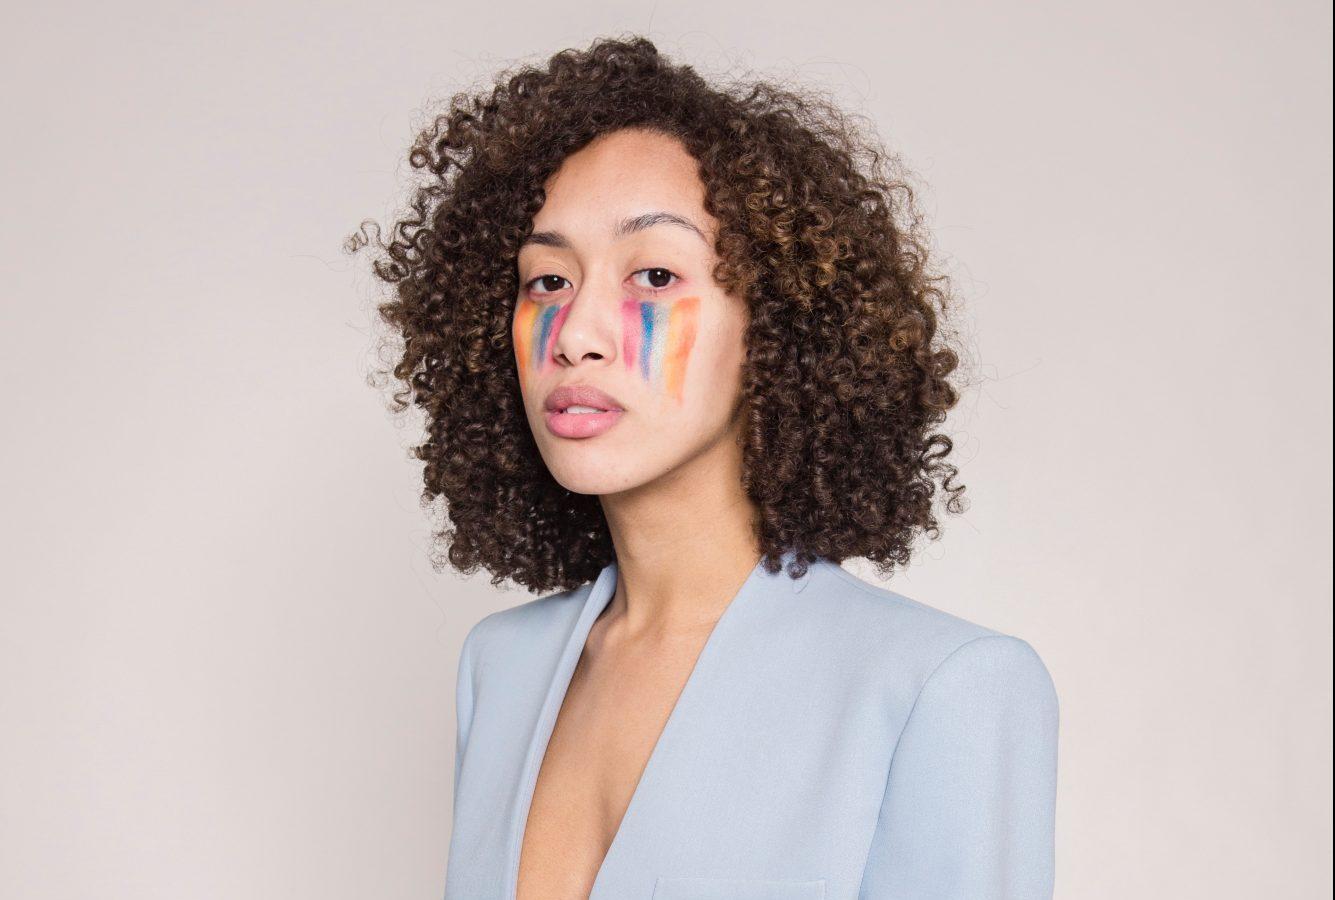 7 beauty brands που δημιούργησαν limited collections αφιερωμένες στο Pride Δεν είναι λίγα τα brands που για να γιορτάσουν το φετινό Pride δημιούργησαν ξεχωριστά προϊόντα και συλλογές. Απο την Morphe και τις πολύχρωμες σκιές της, ως εκθαμβωτικά highlighter Becca και ιριδίζον eye-liner Urban Decay, όλα είναι αφιερωμένα στην υποστήριξη της ΛΟΑΤΚΙ+ κοινότητας.